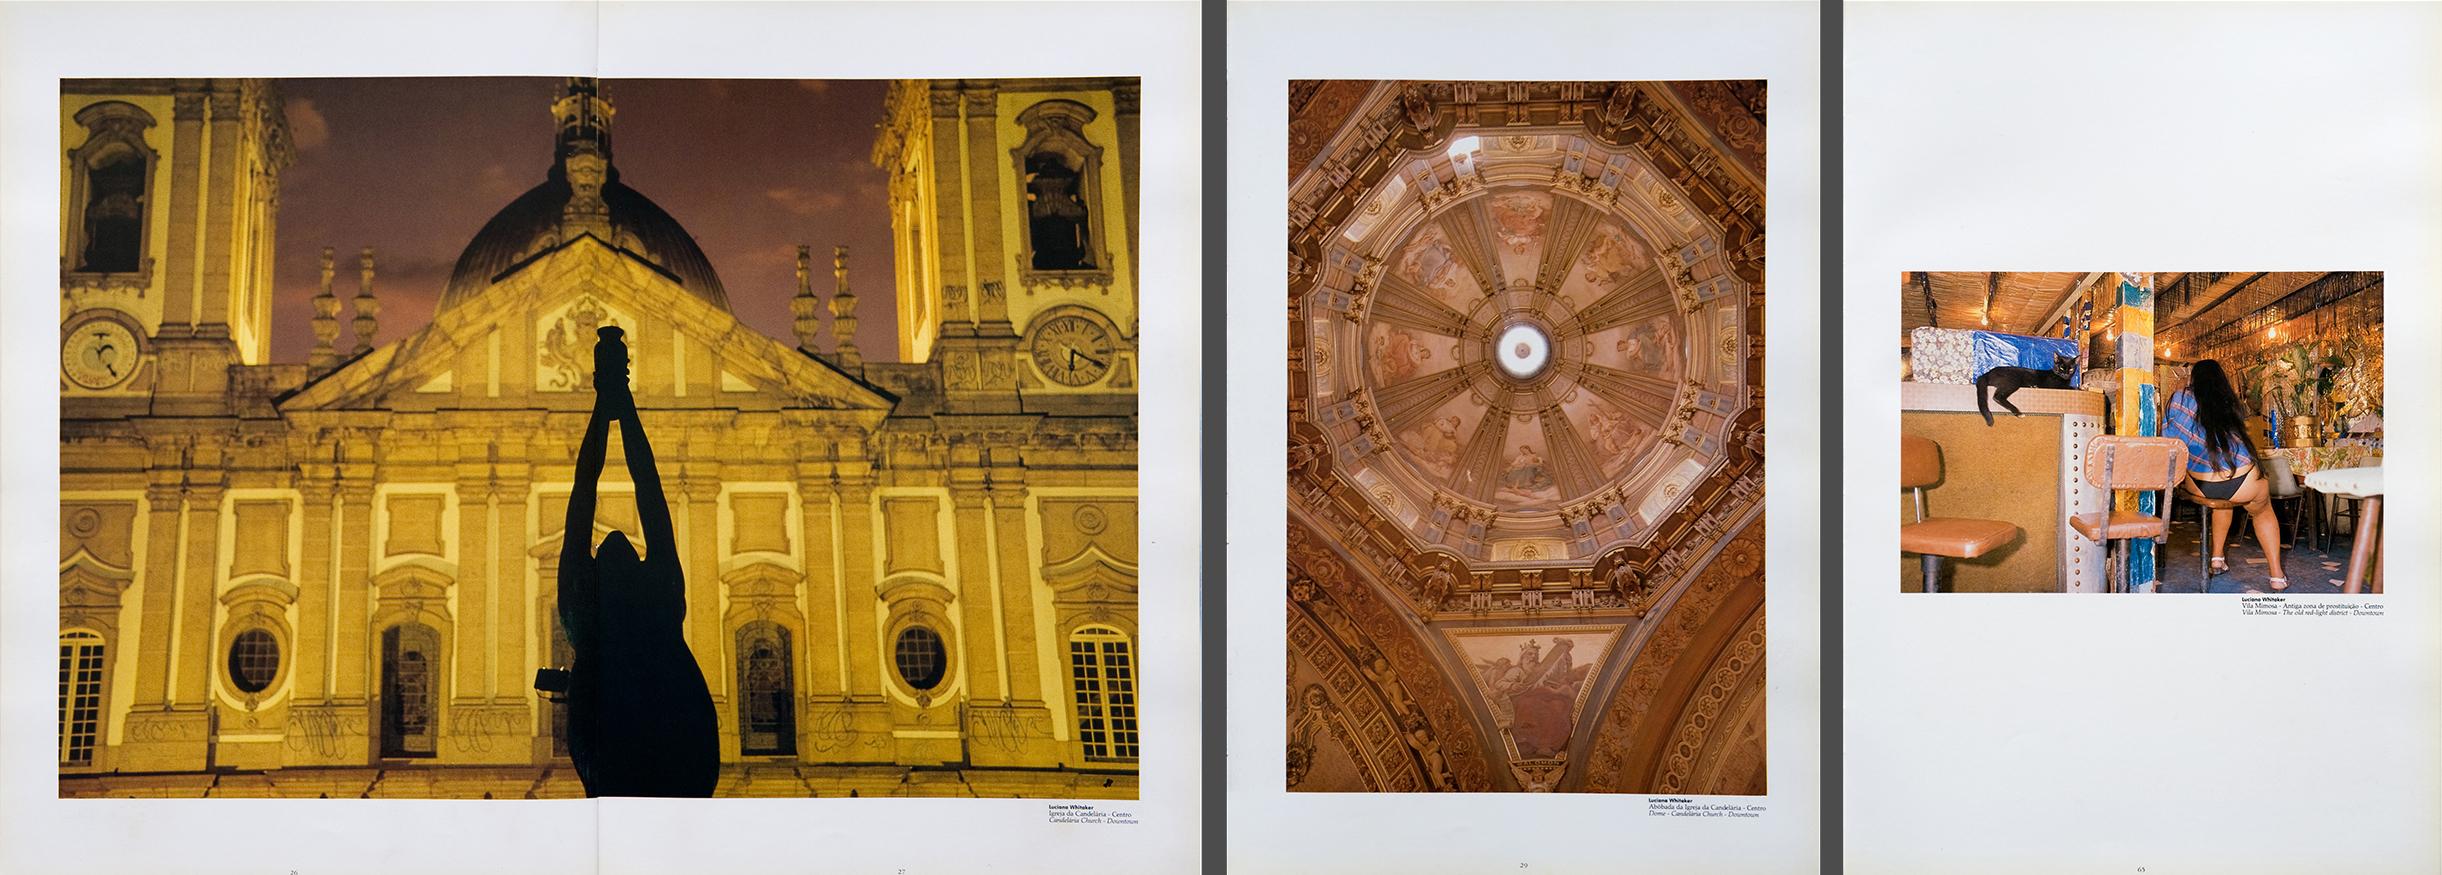 Rio Through the Eyes of its Photographers, Ed Ver Curiosidades, Brazil 1992